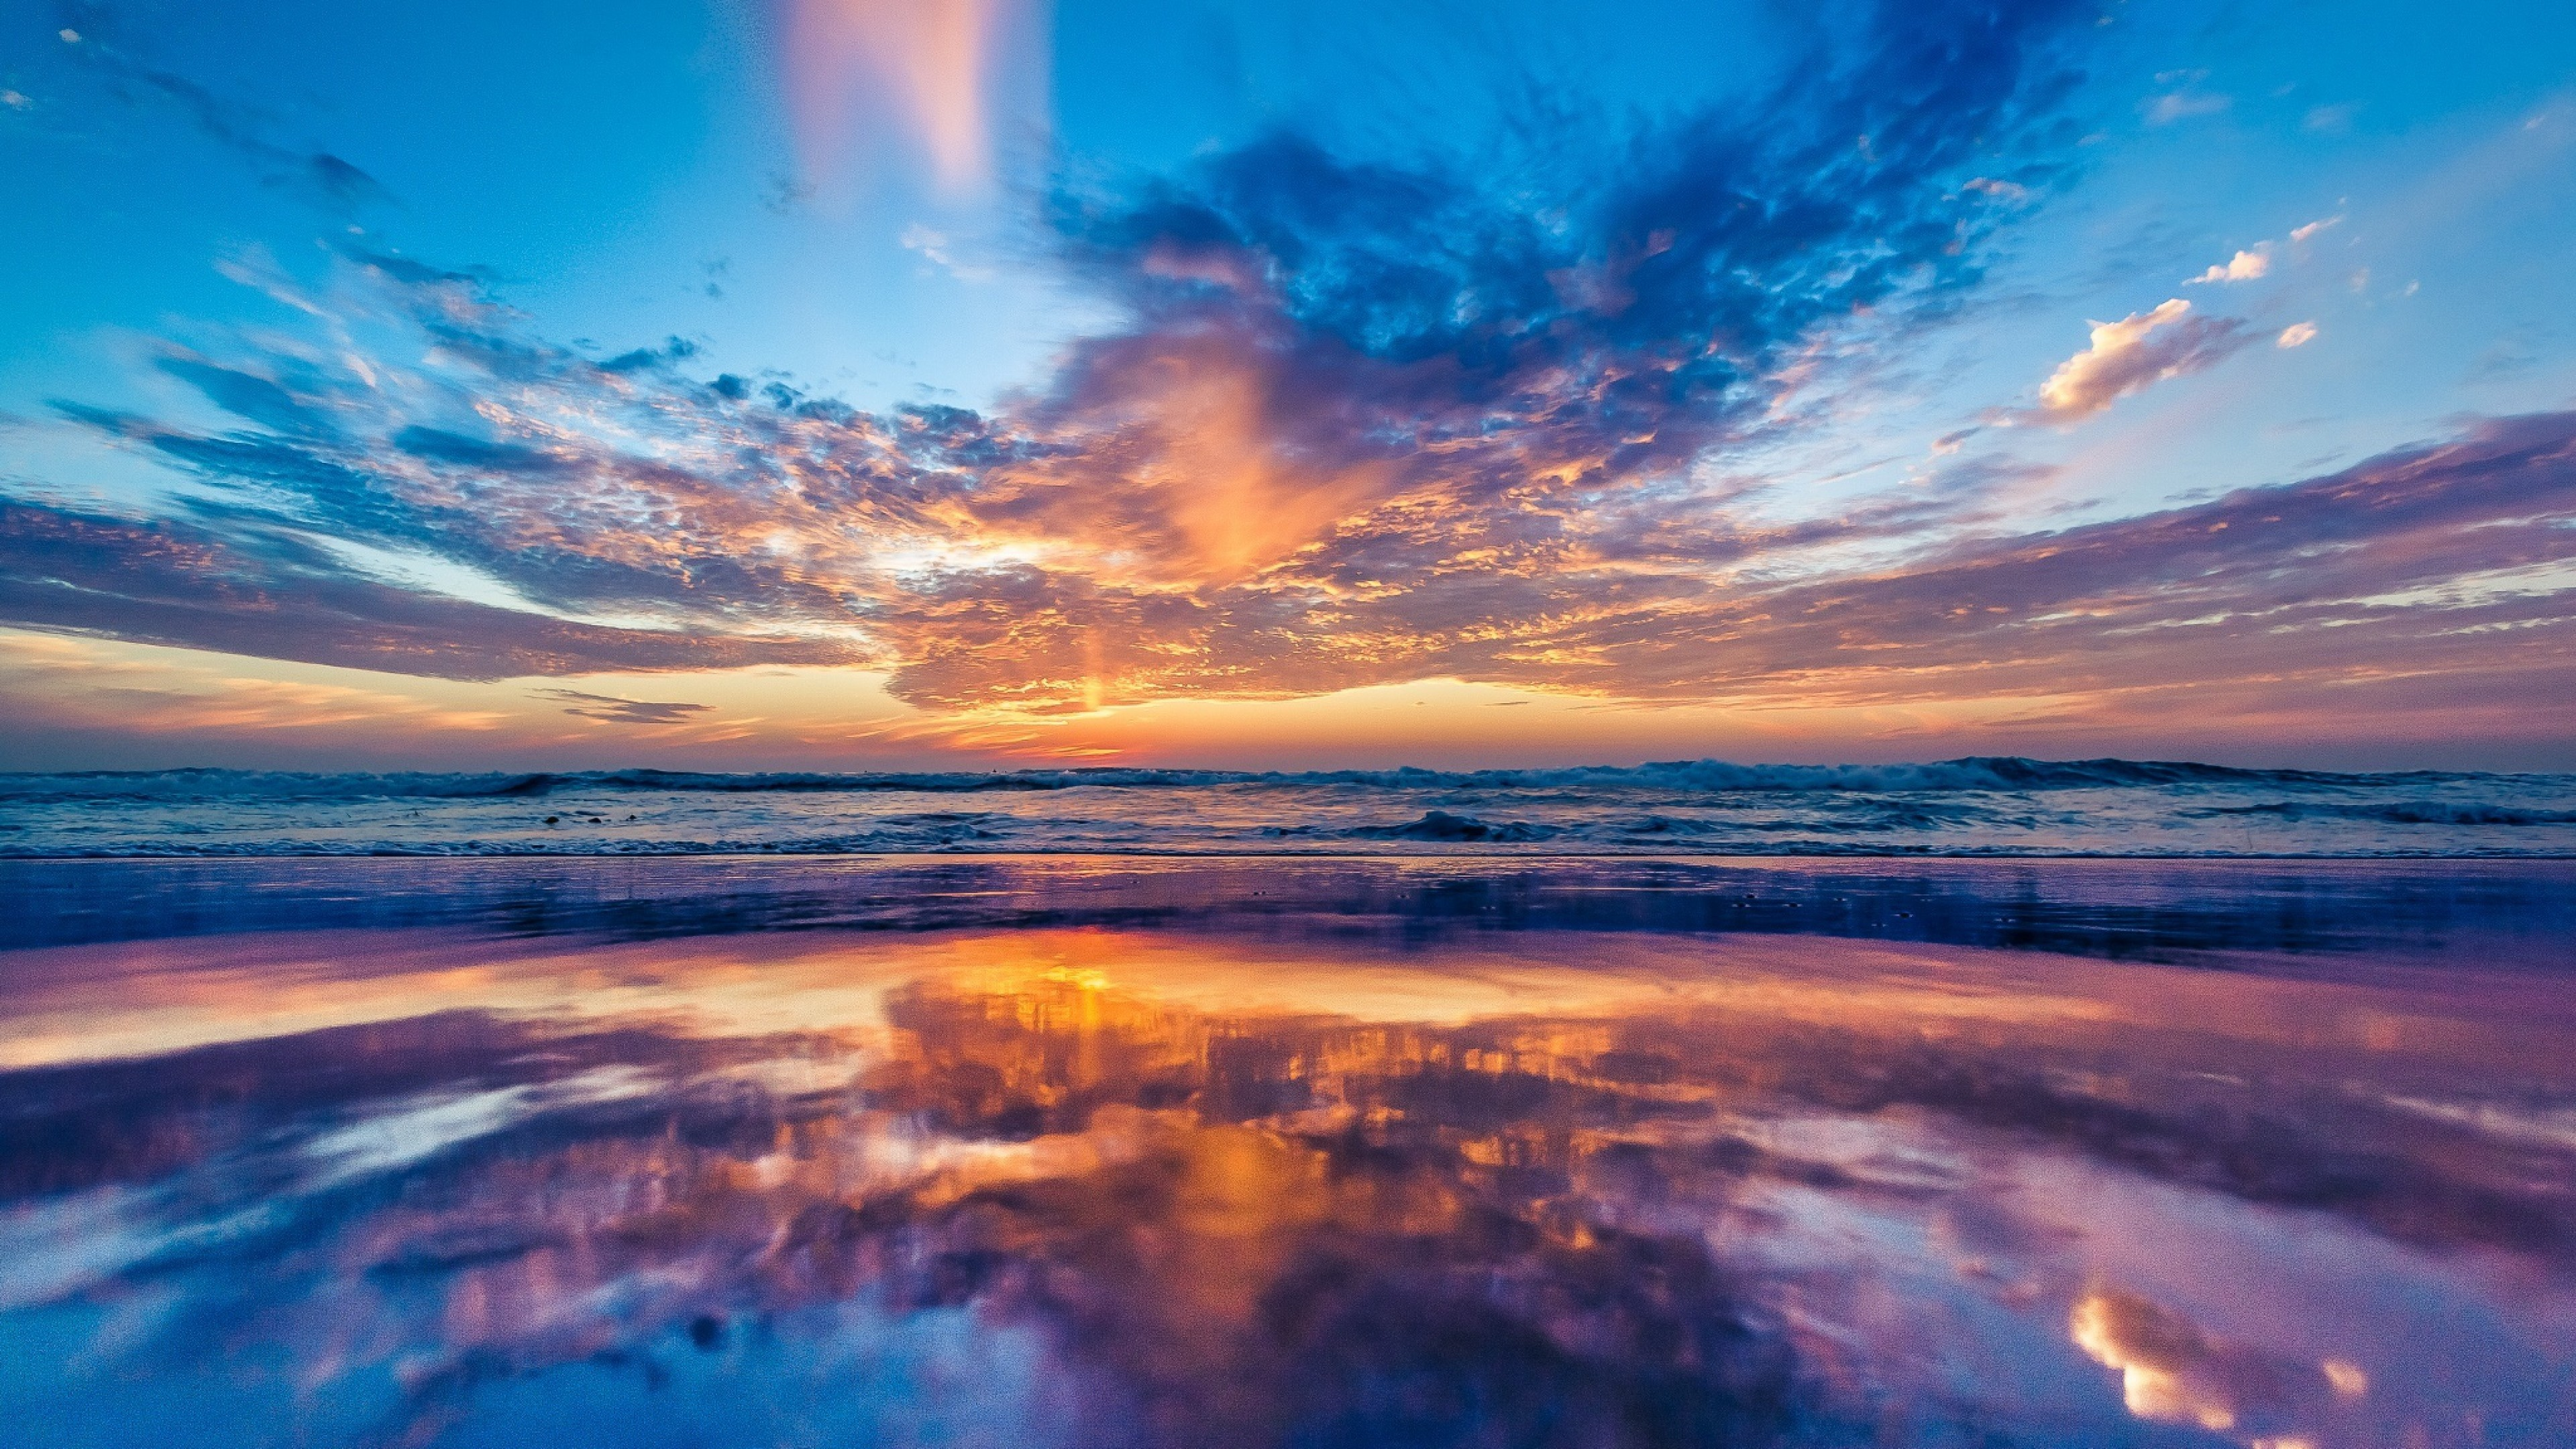 Res: 3840x2160, Ocean Sky Sunset Beach